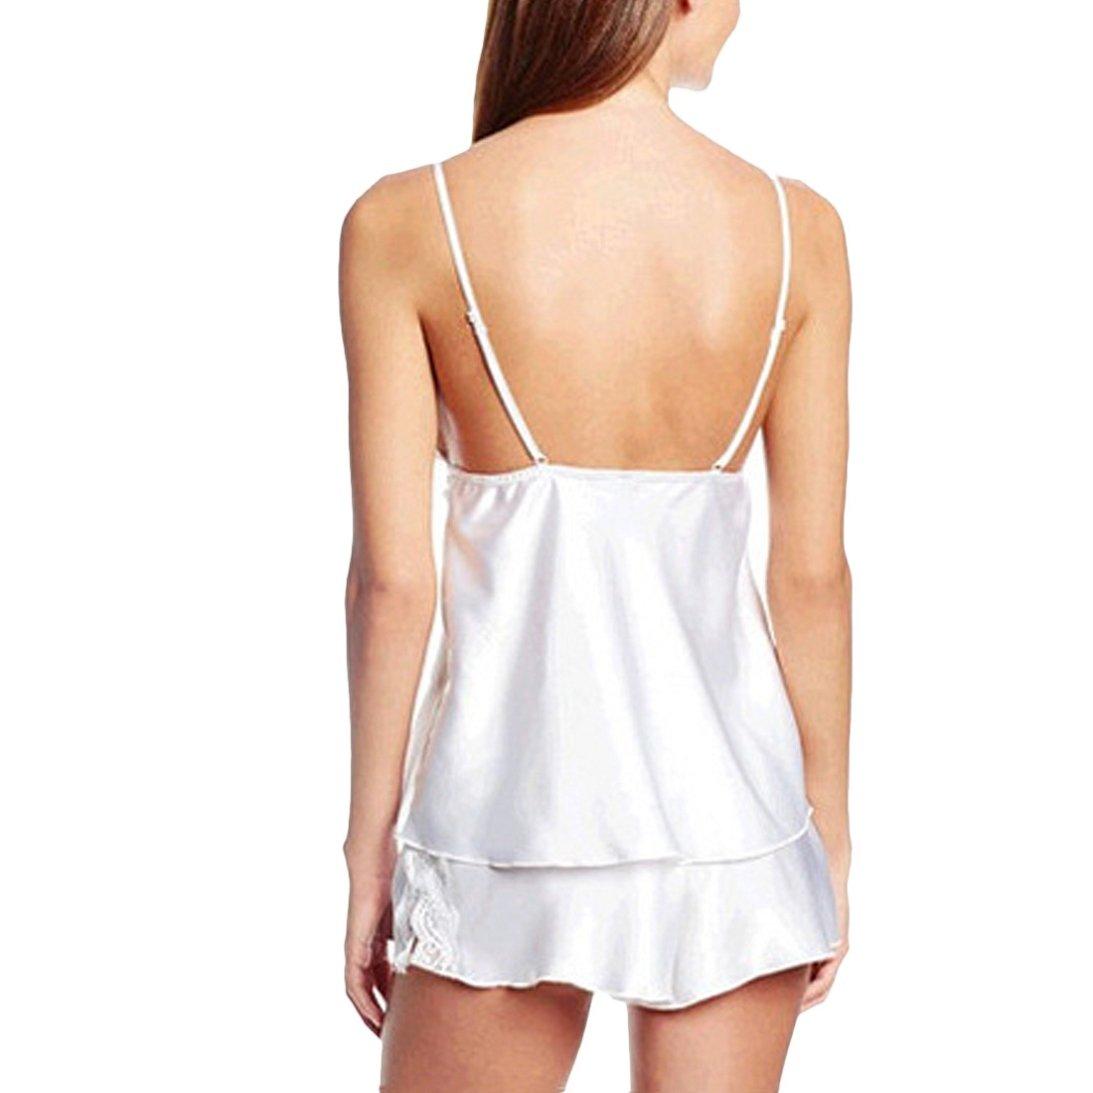 bda8927b7a6 Amazon.com  Sunward Sexy Women s Short + Tank Tops Sleep Set Summer Lace  Pajamas Short Set  Clothing